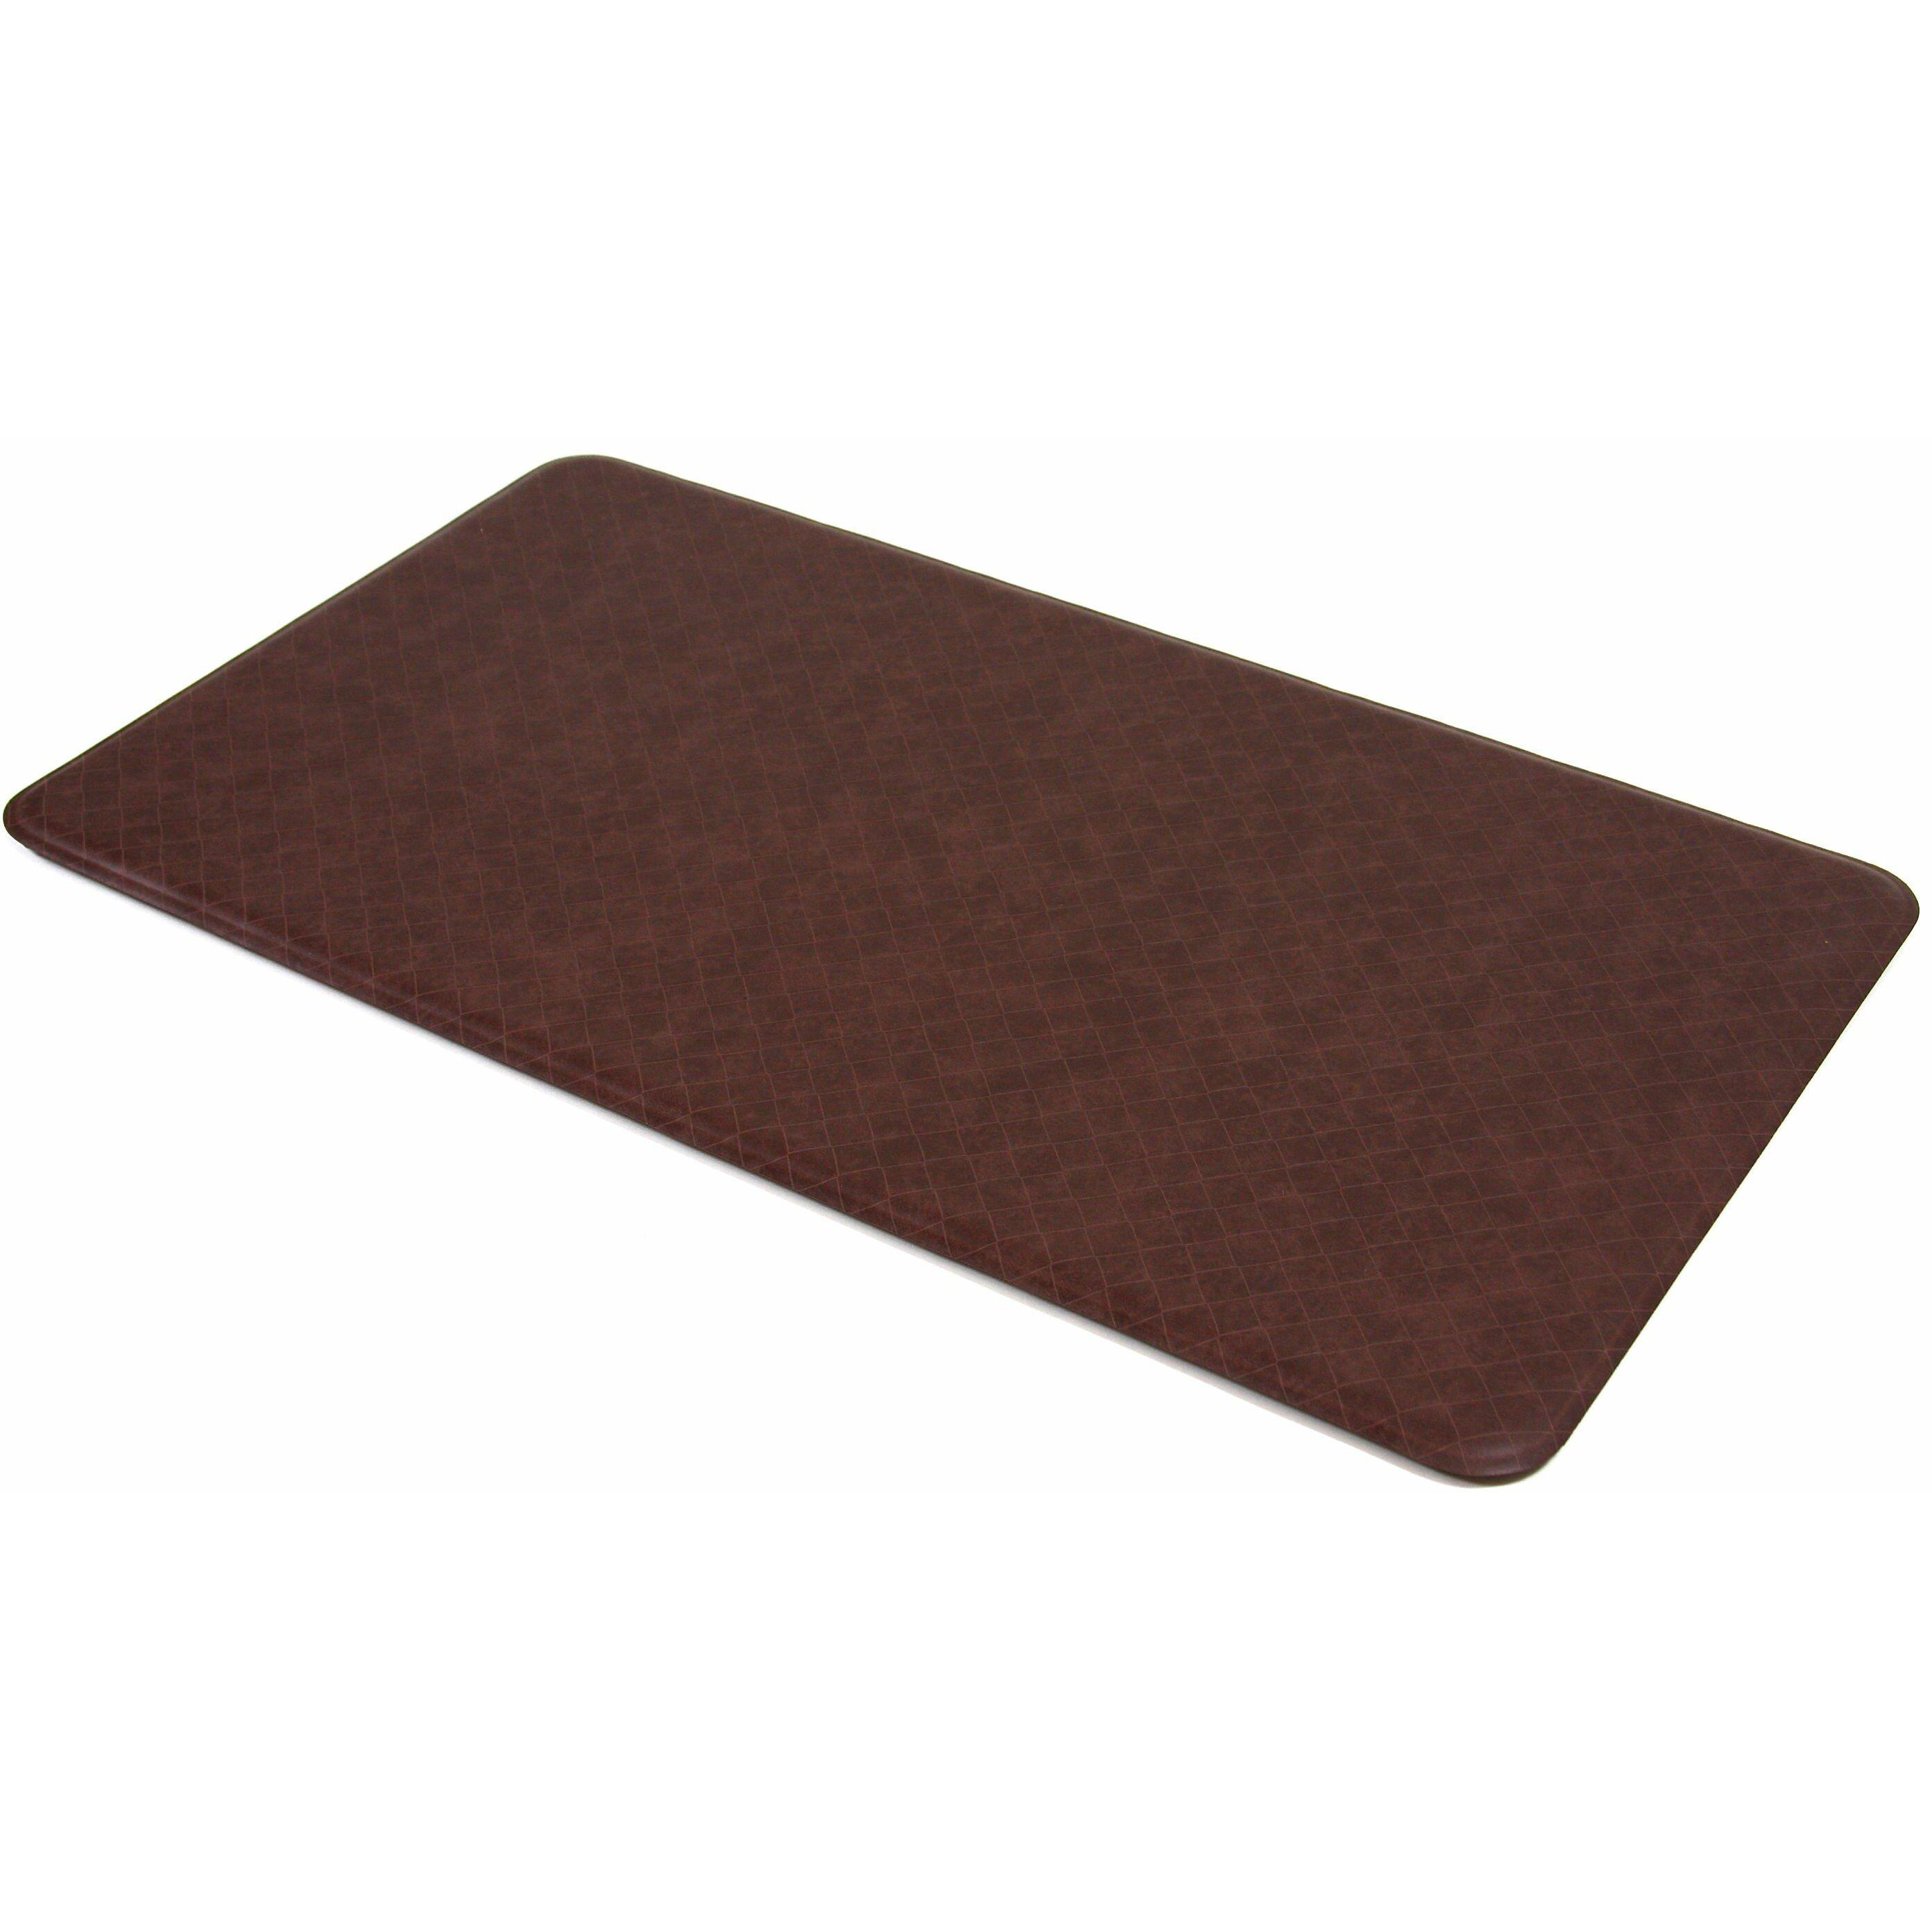 Solid Color Kitchen Rugs Imprint Comfort Mats Nantucket Solid Kitchen Mat Reviews Wayfair